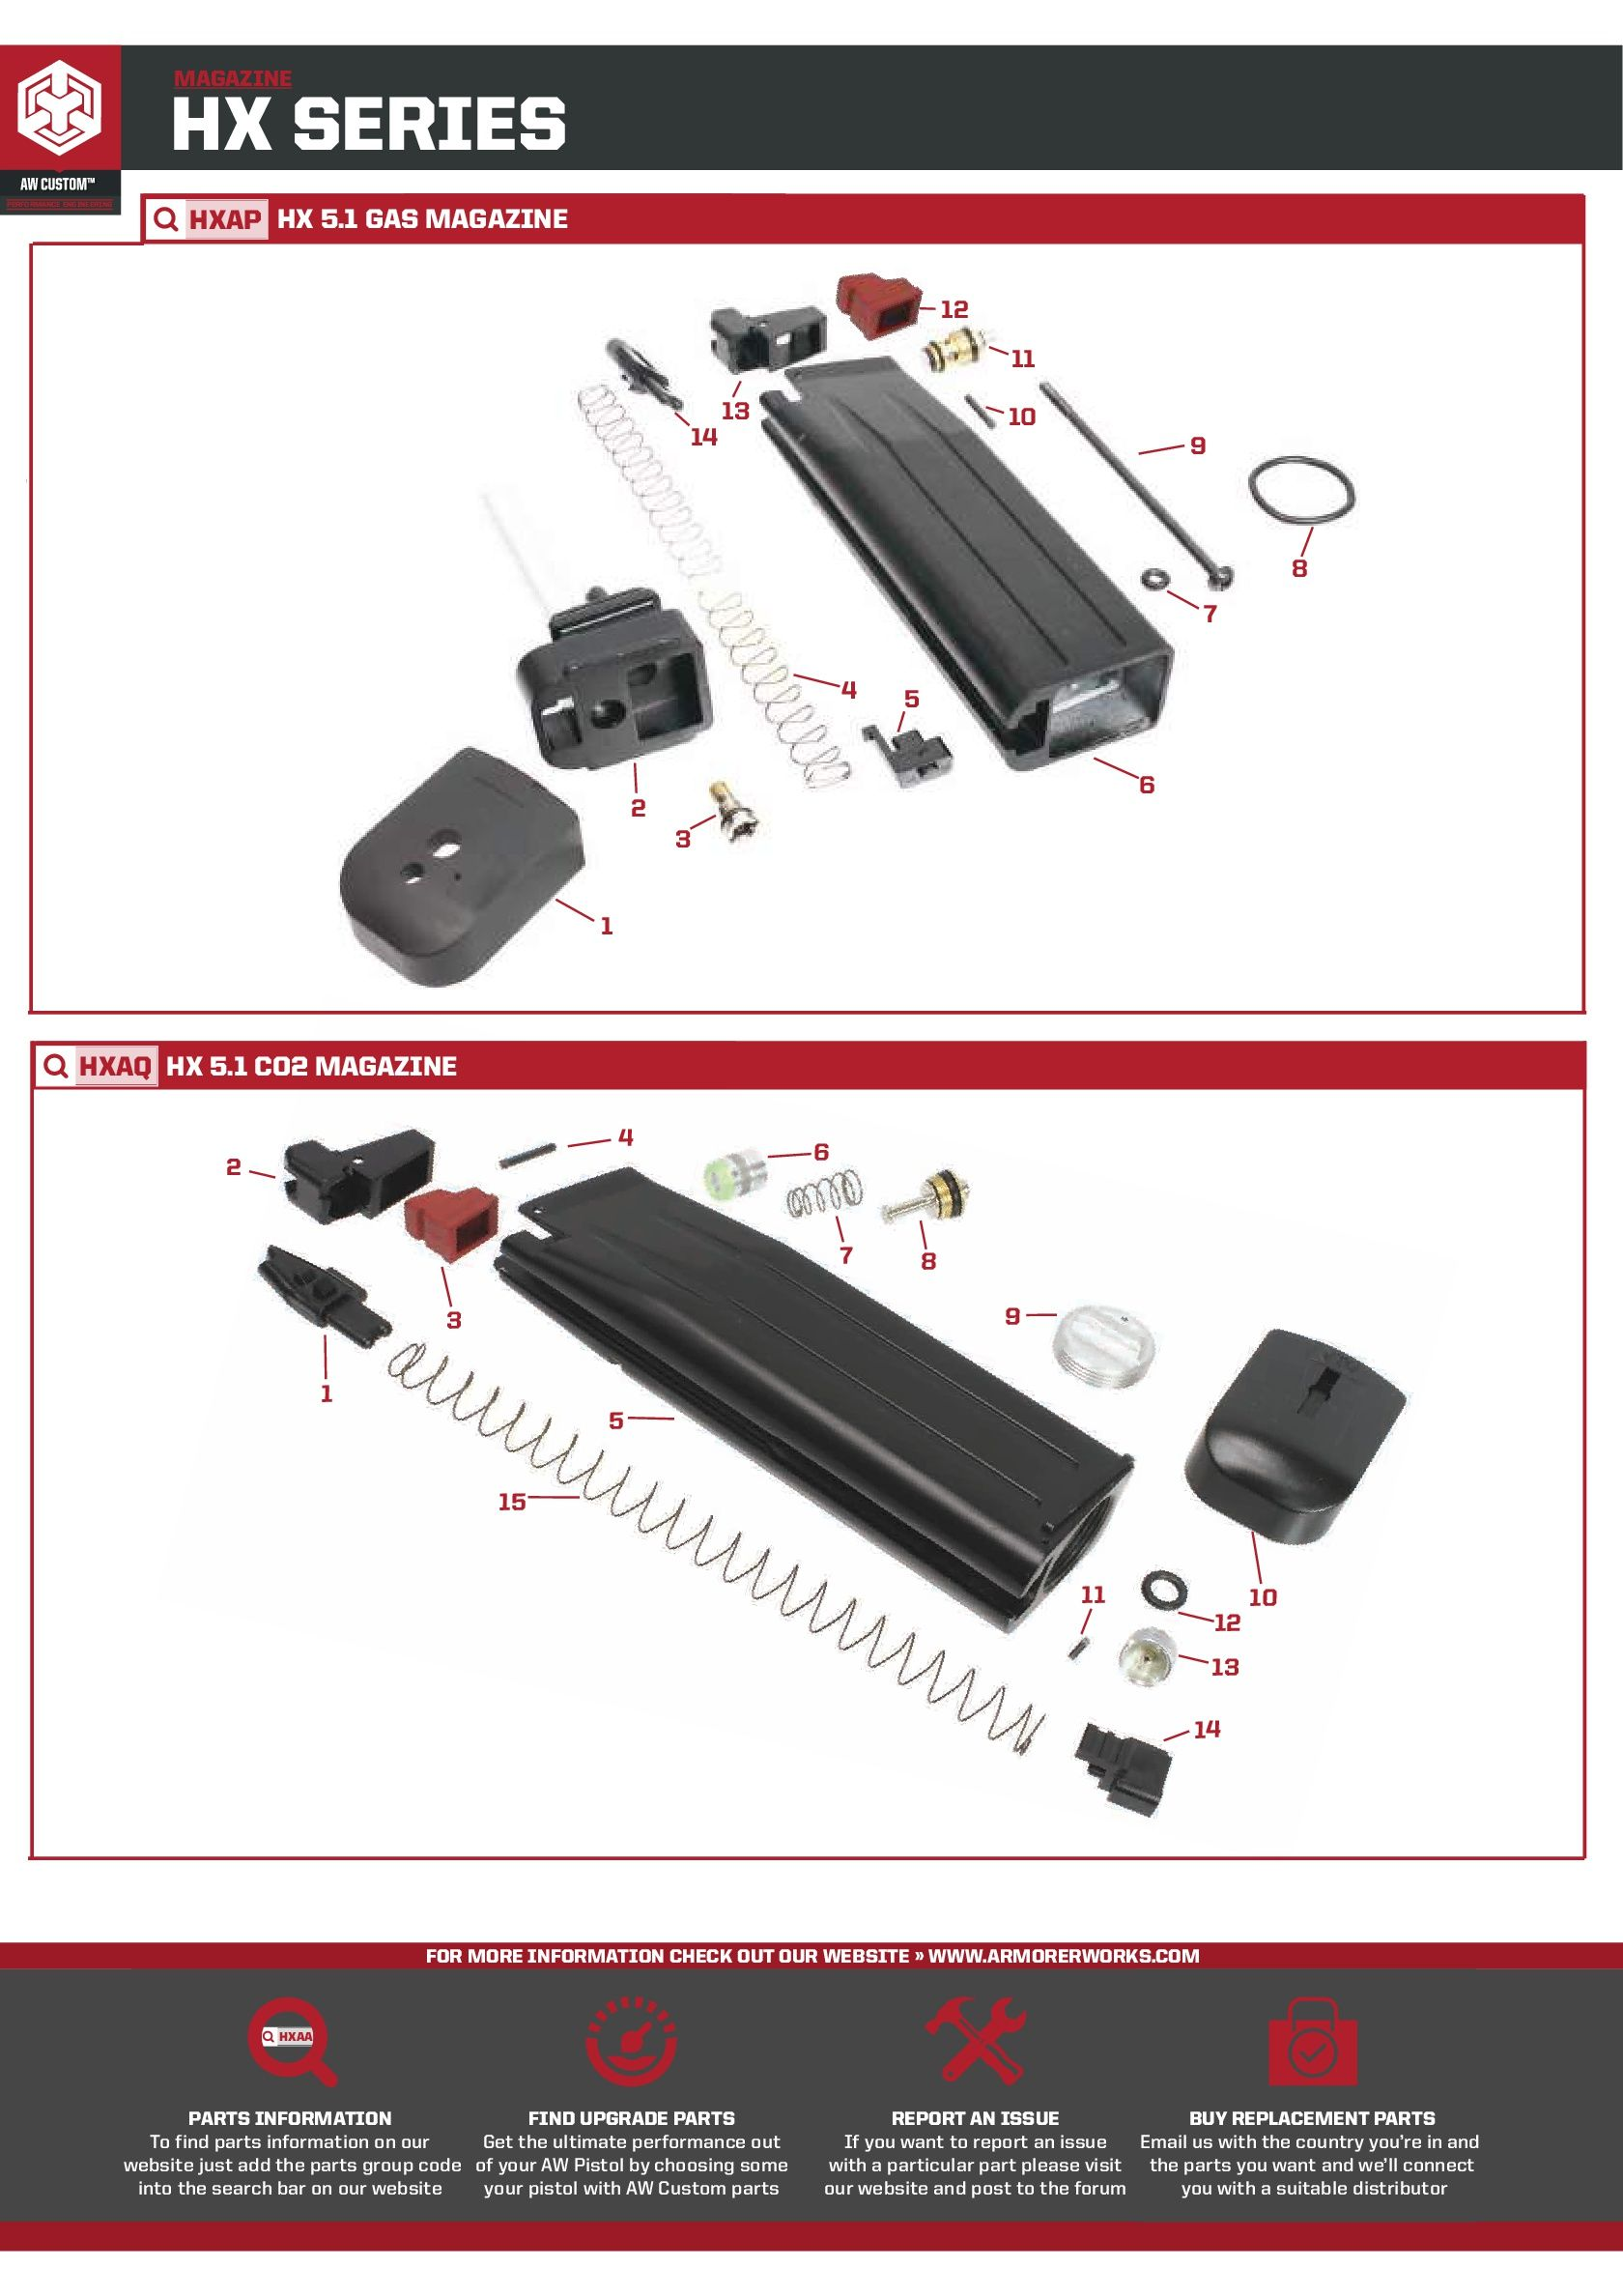 medium resolution of aw custom gas co2 magazine parts